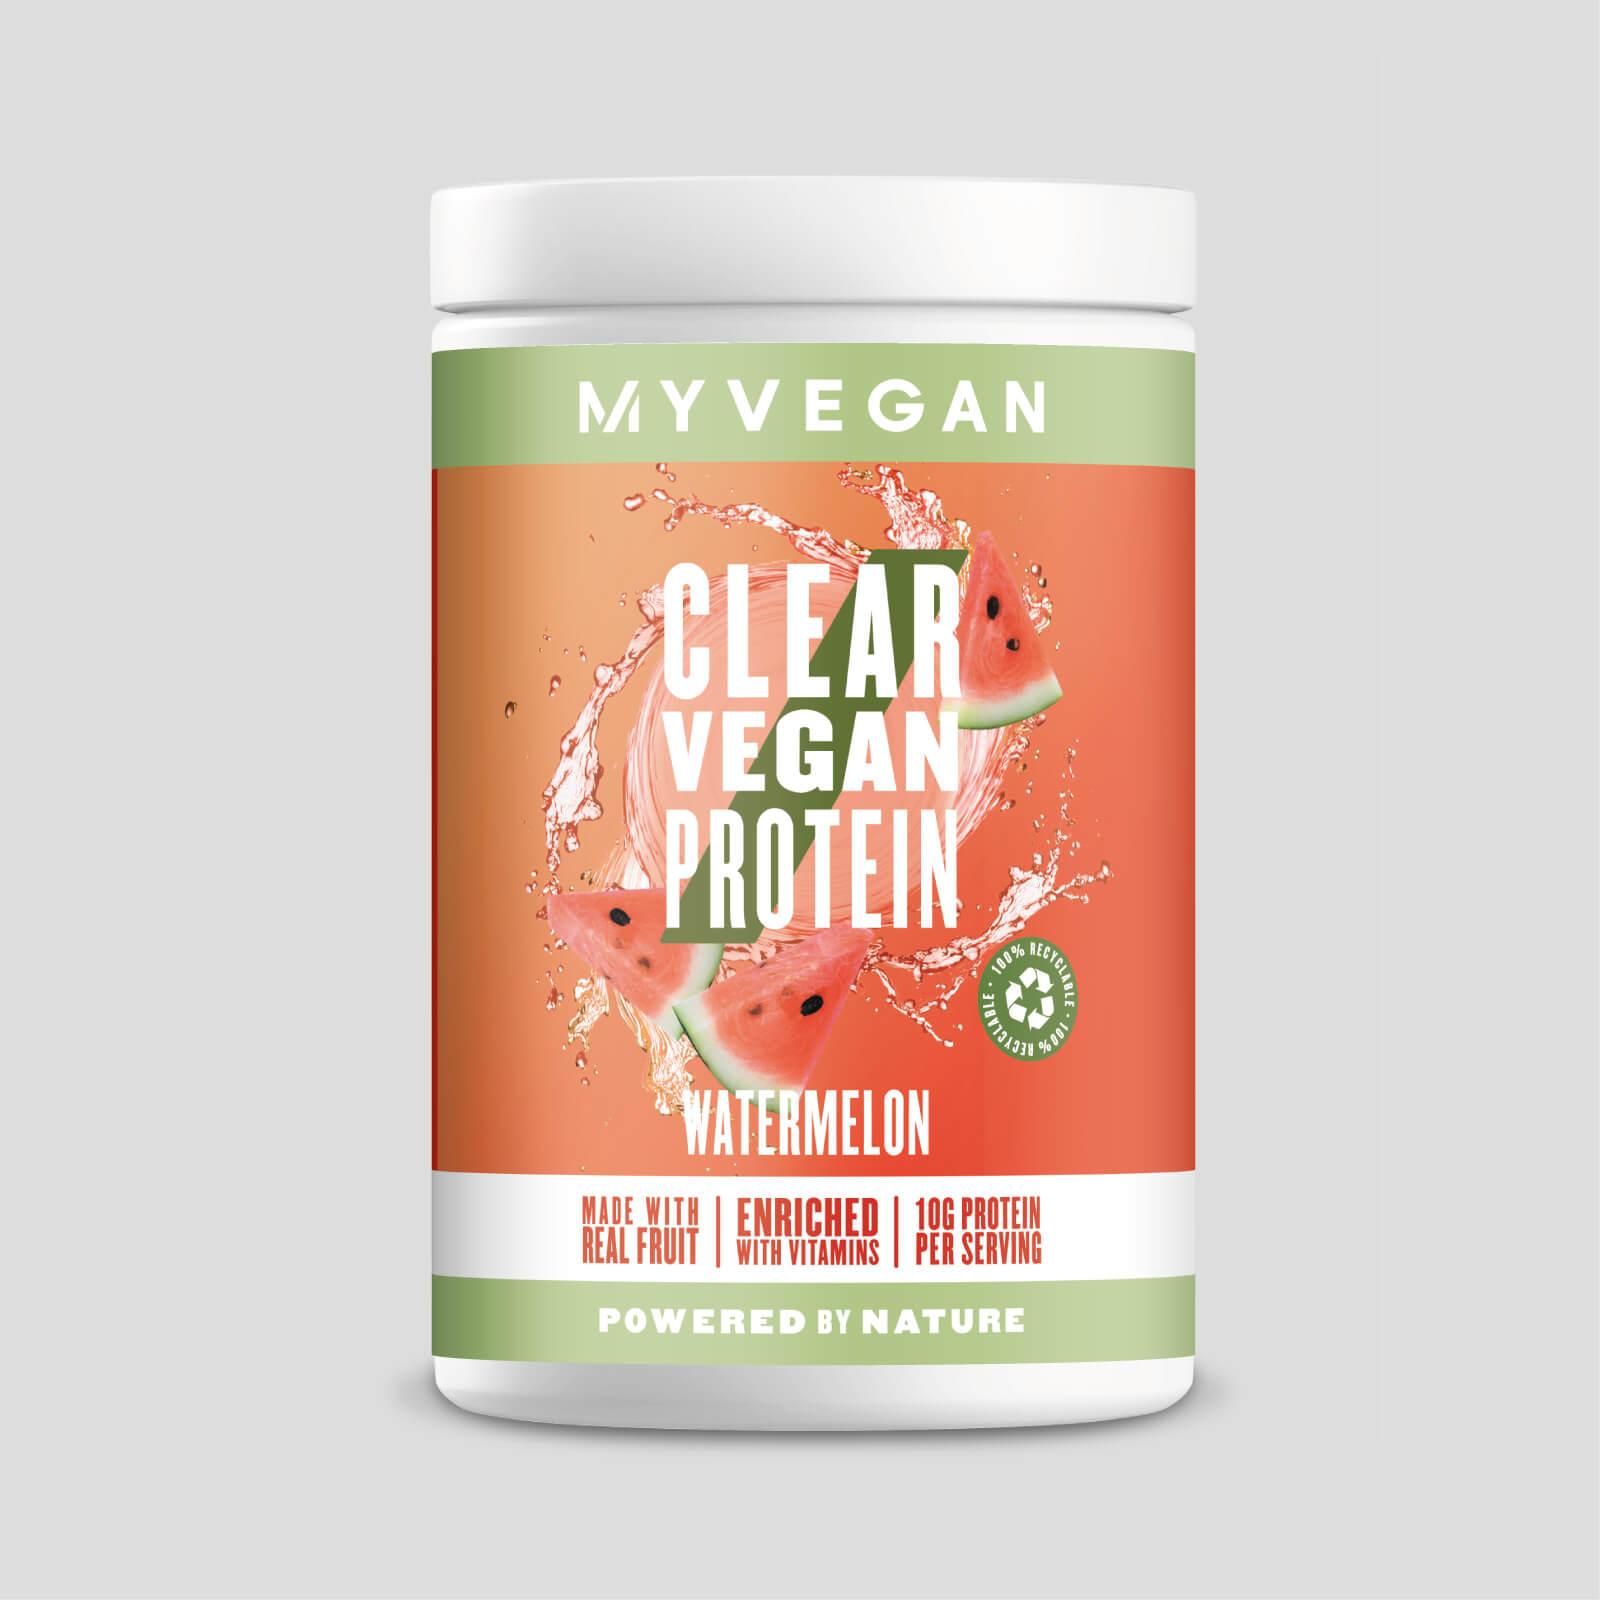 Myvegan Clear Vegan Protein - 40servings - Pastèque